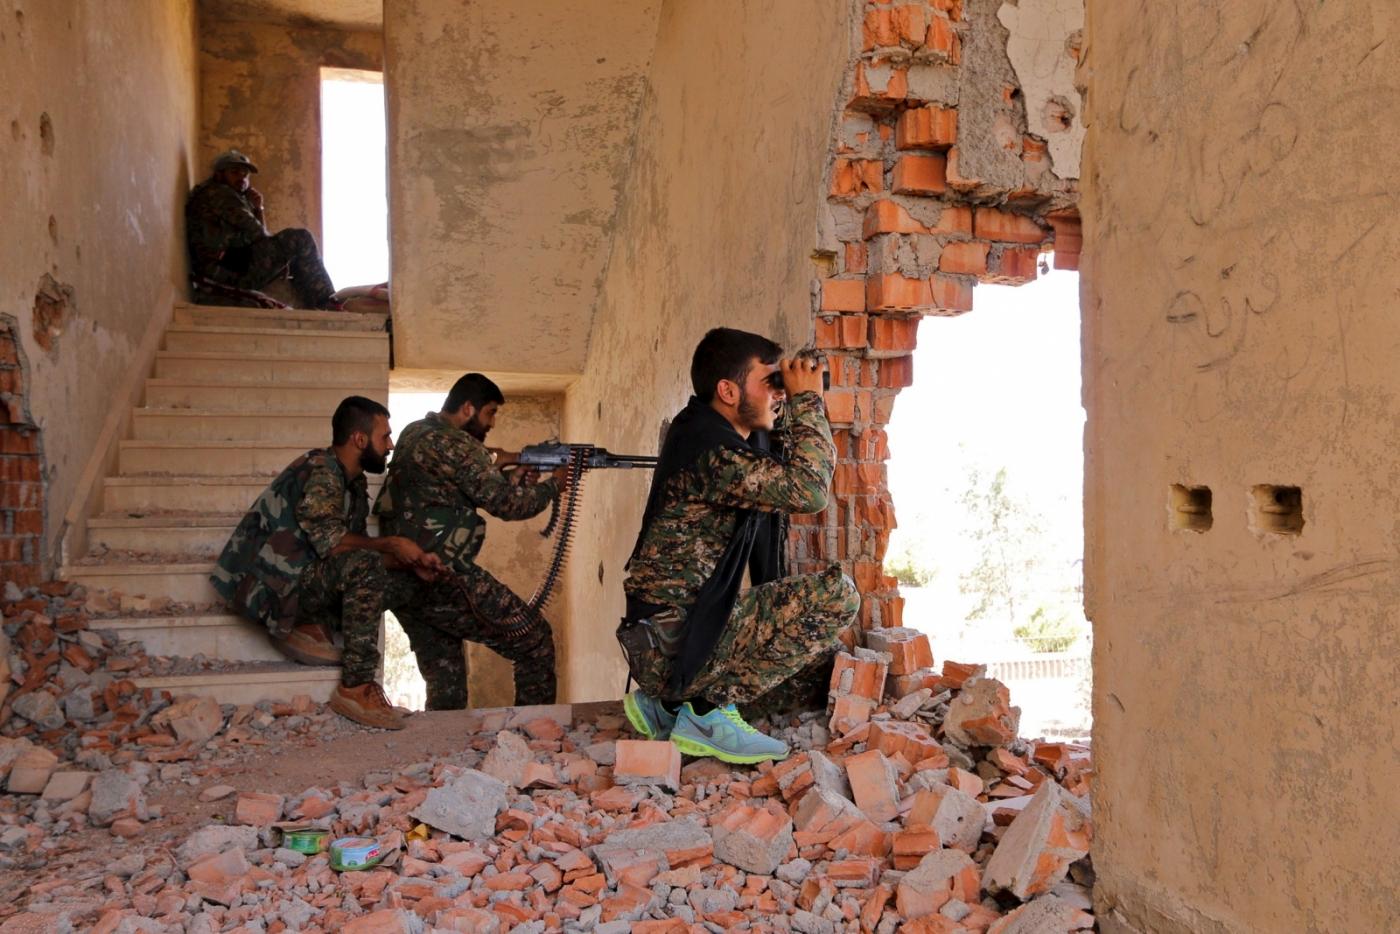 syria-ypg-militia-capture-sarrin-isis.jpg